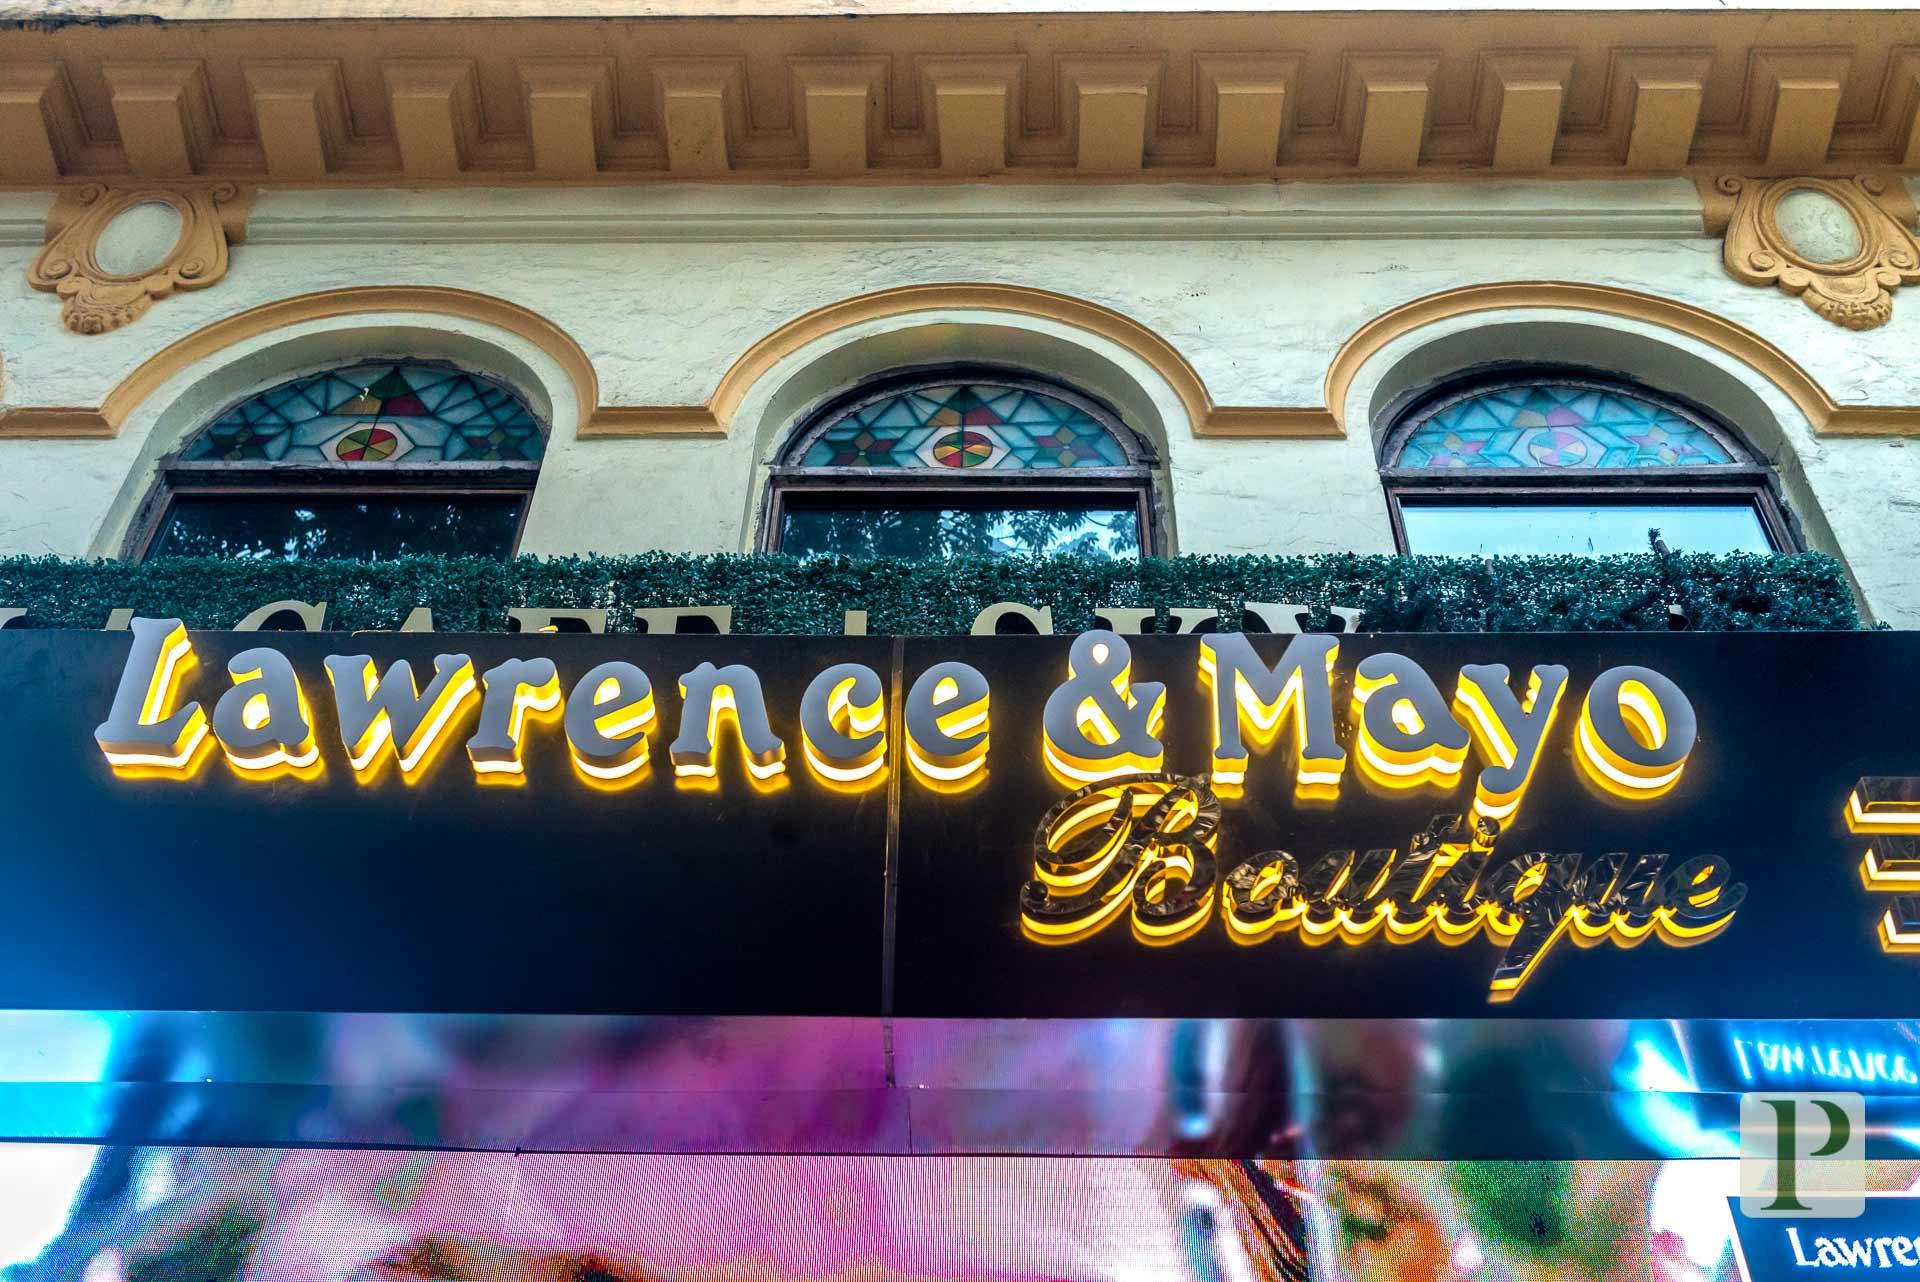 Lawrance-&-Mayo-Boutique-(3).jpg